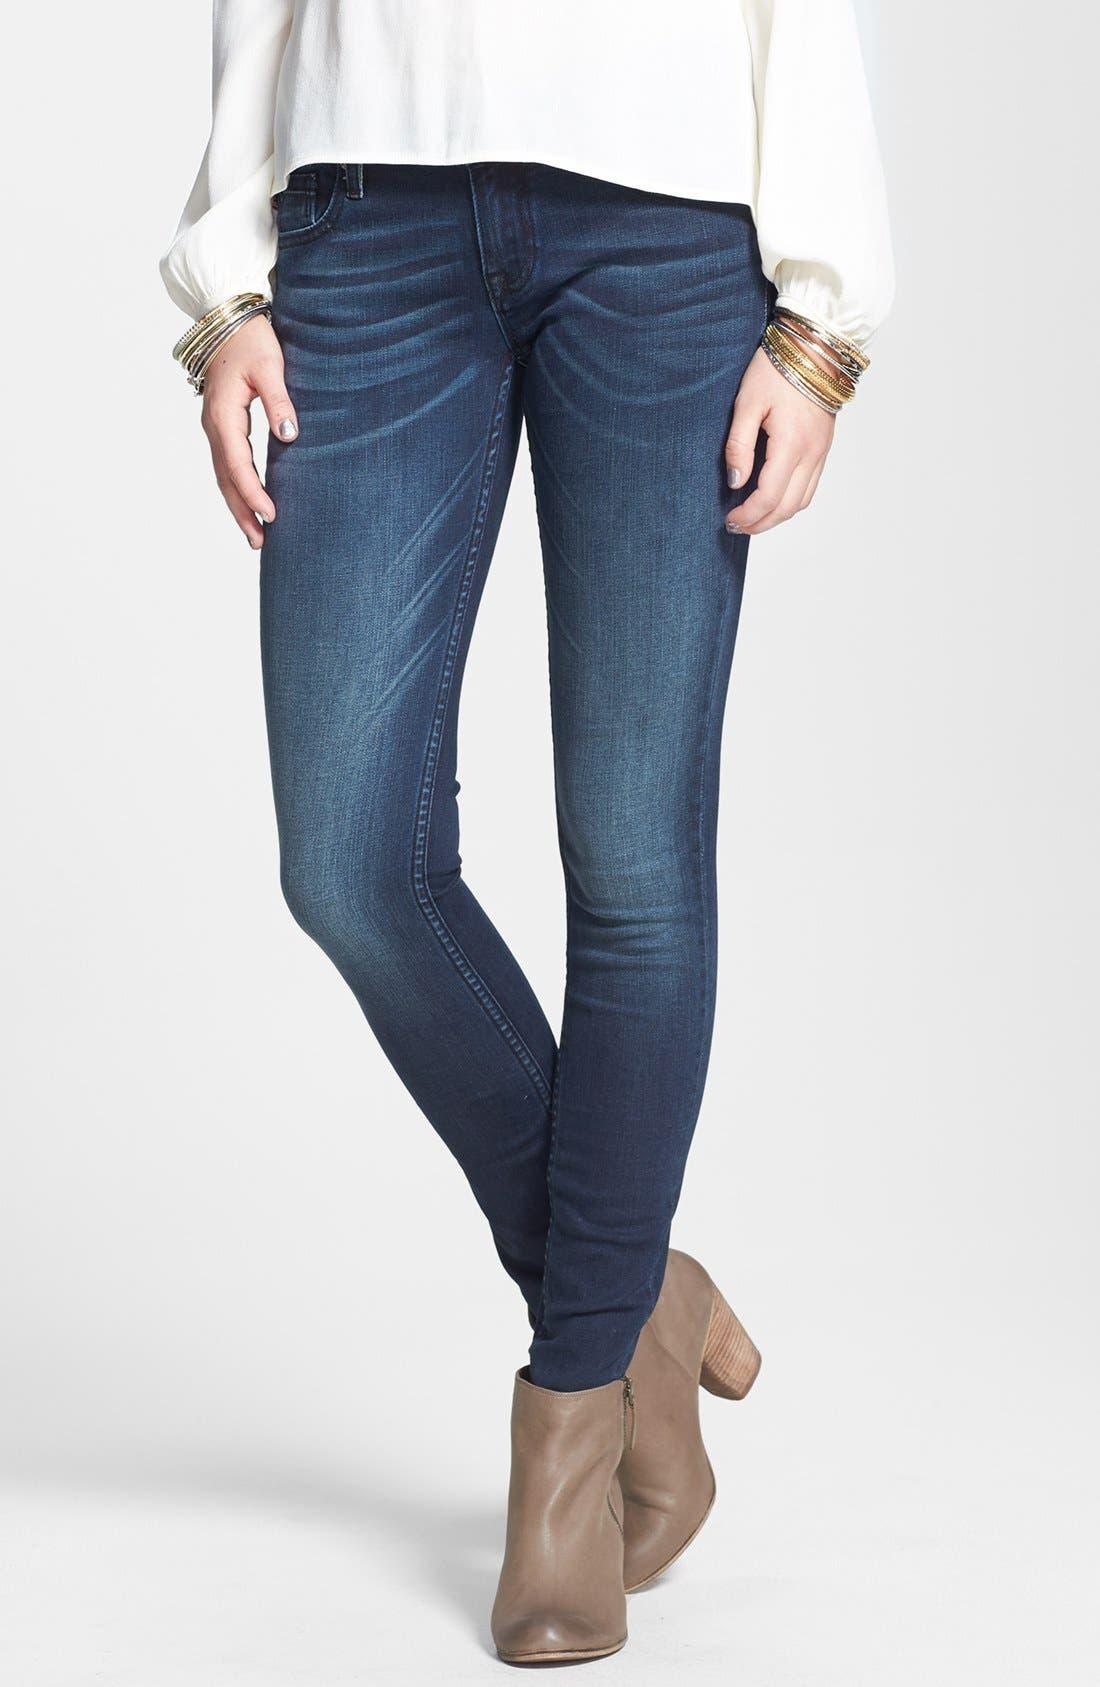 Alternate Image 1 Selected - Vigoss 'New York' Flap Pocket Skinny Jeans (Ink)